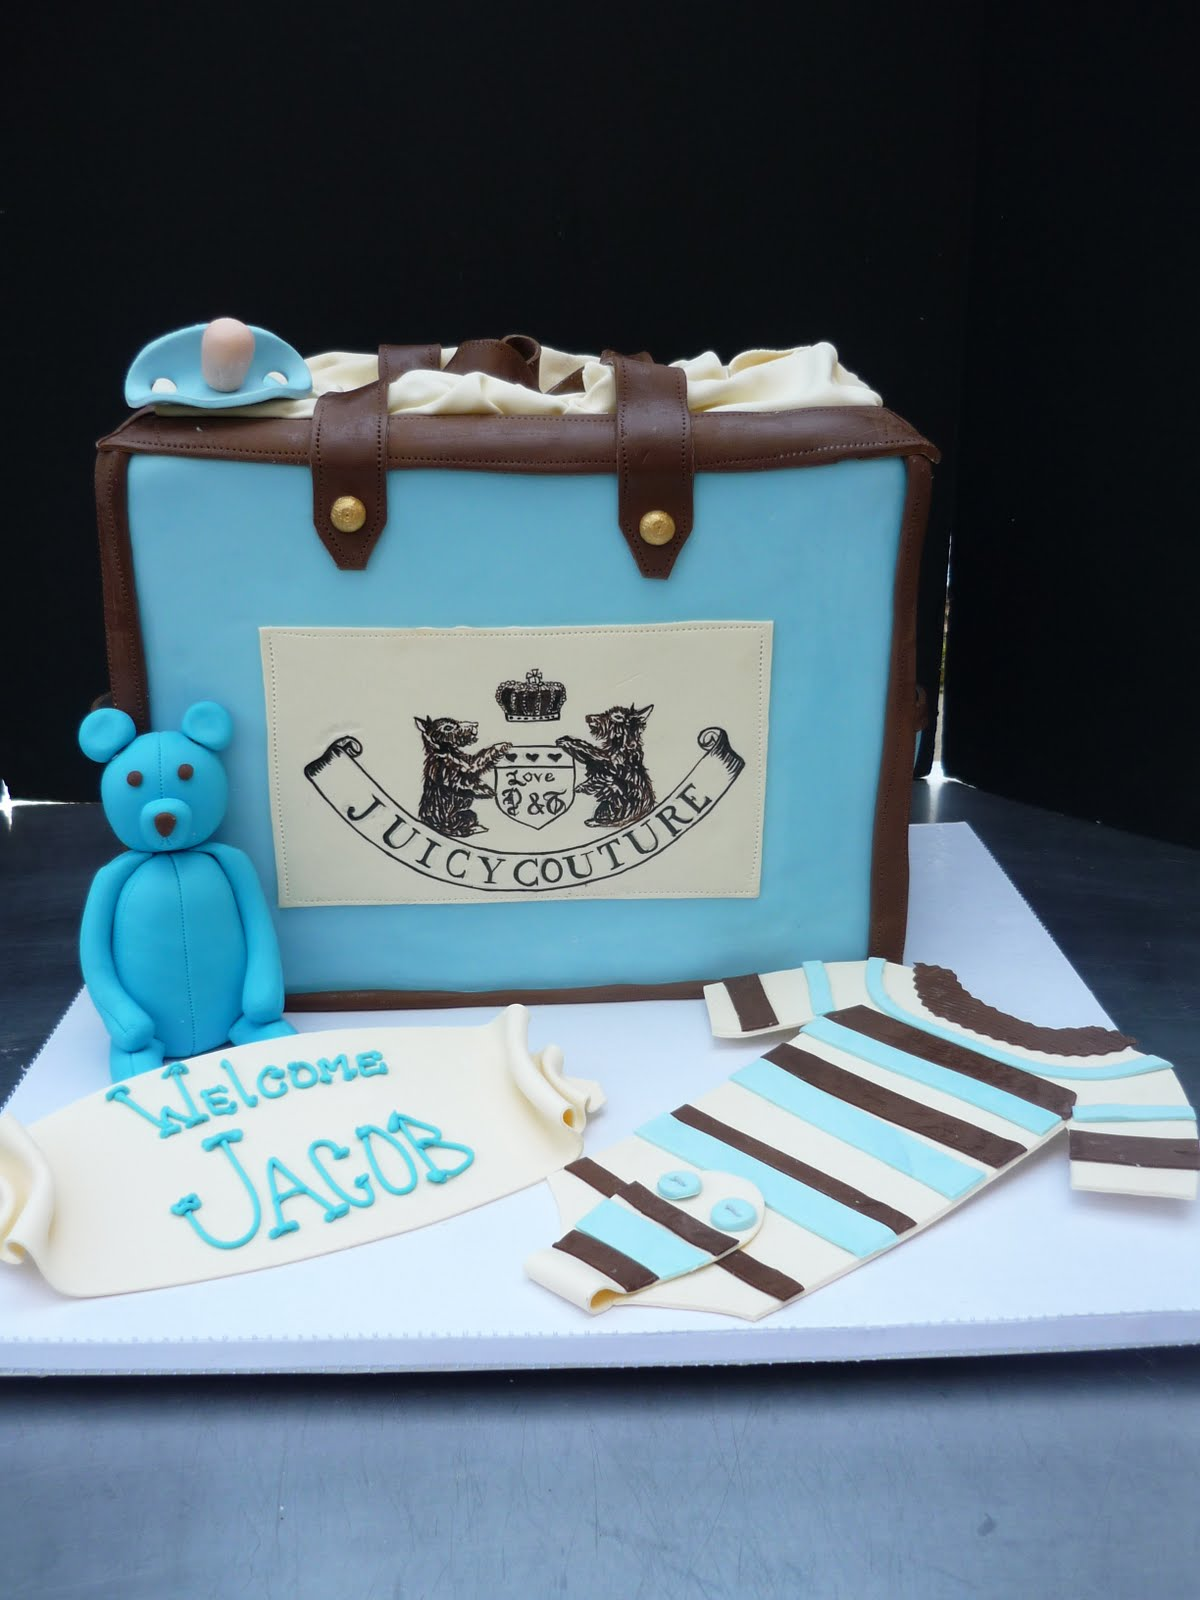 Artisan Bake Shop Juicy Couture Baby Shower Cake